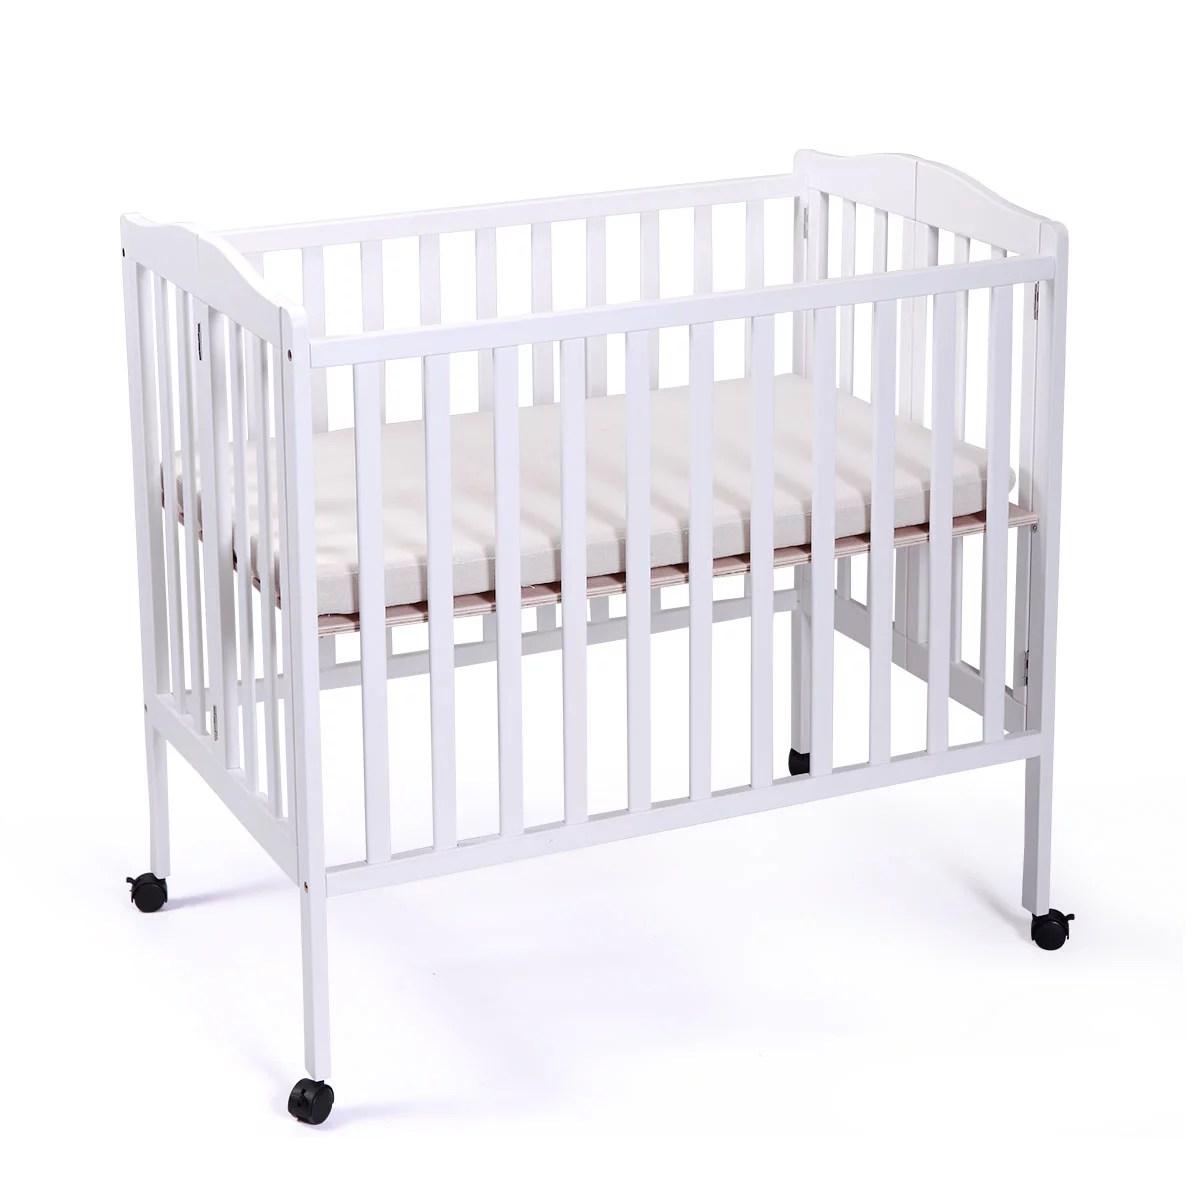 Tobbi Baby Side Crib Wooden Toddler Bed Tiendamia Com